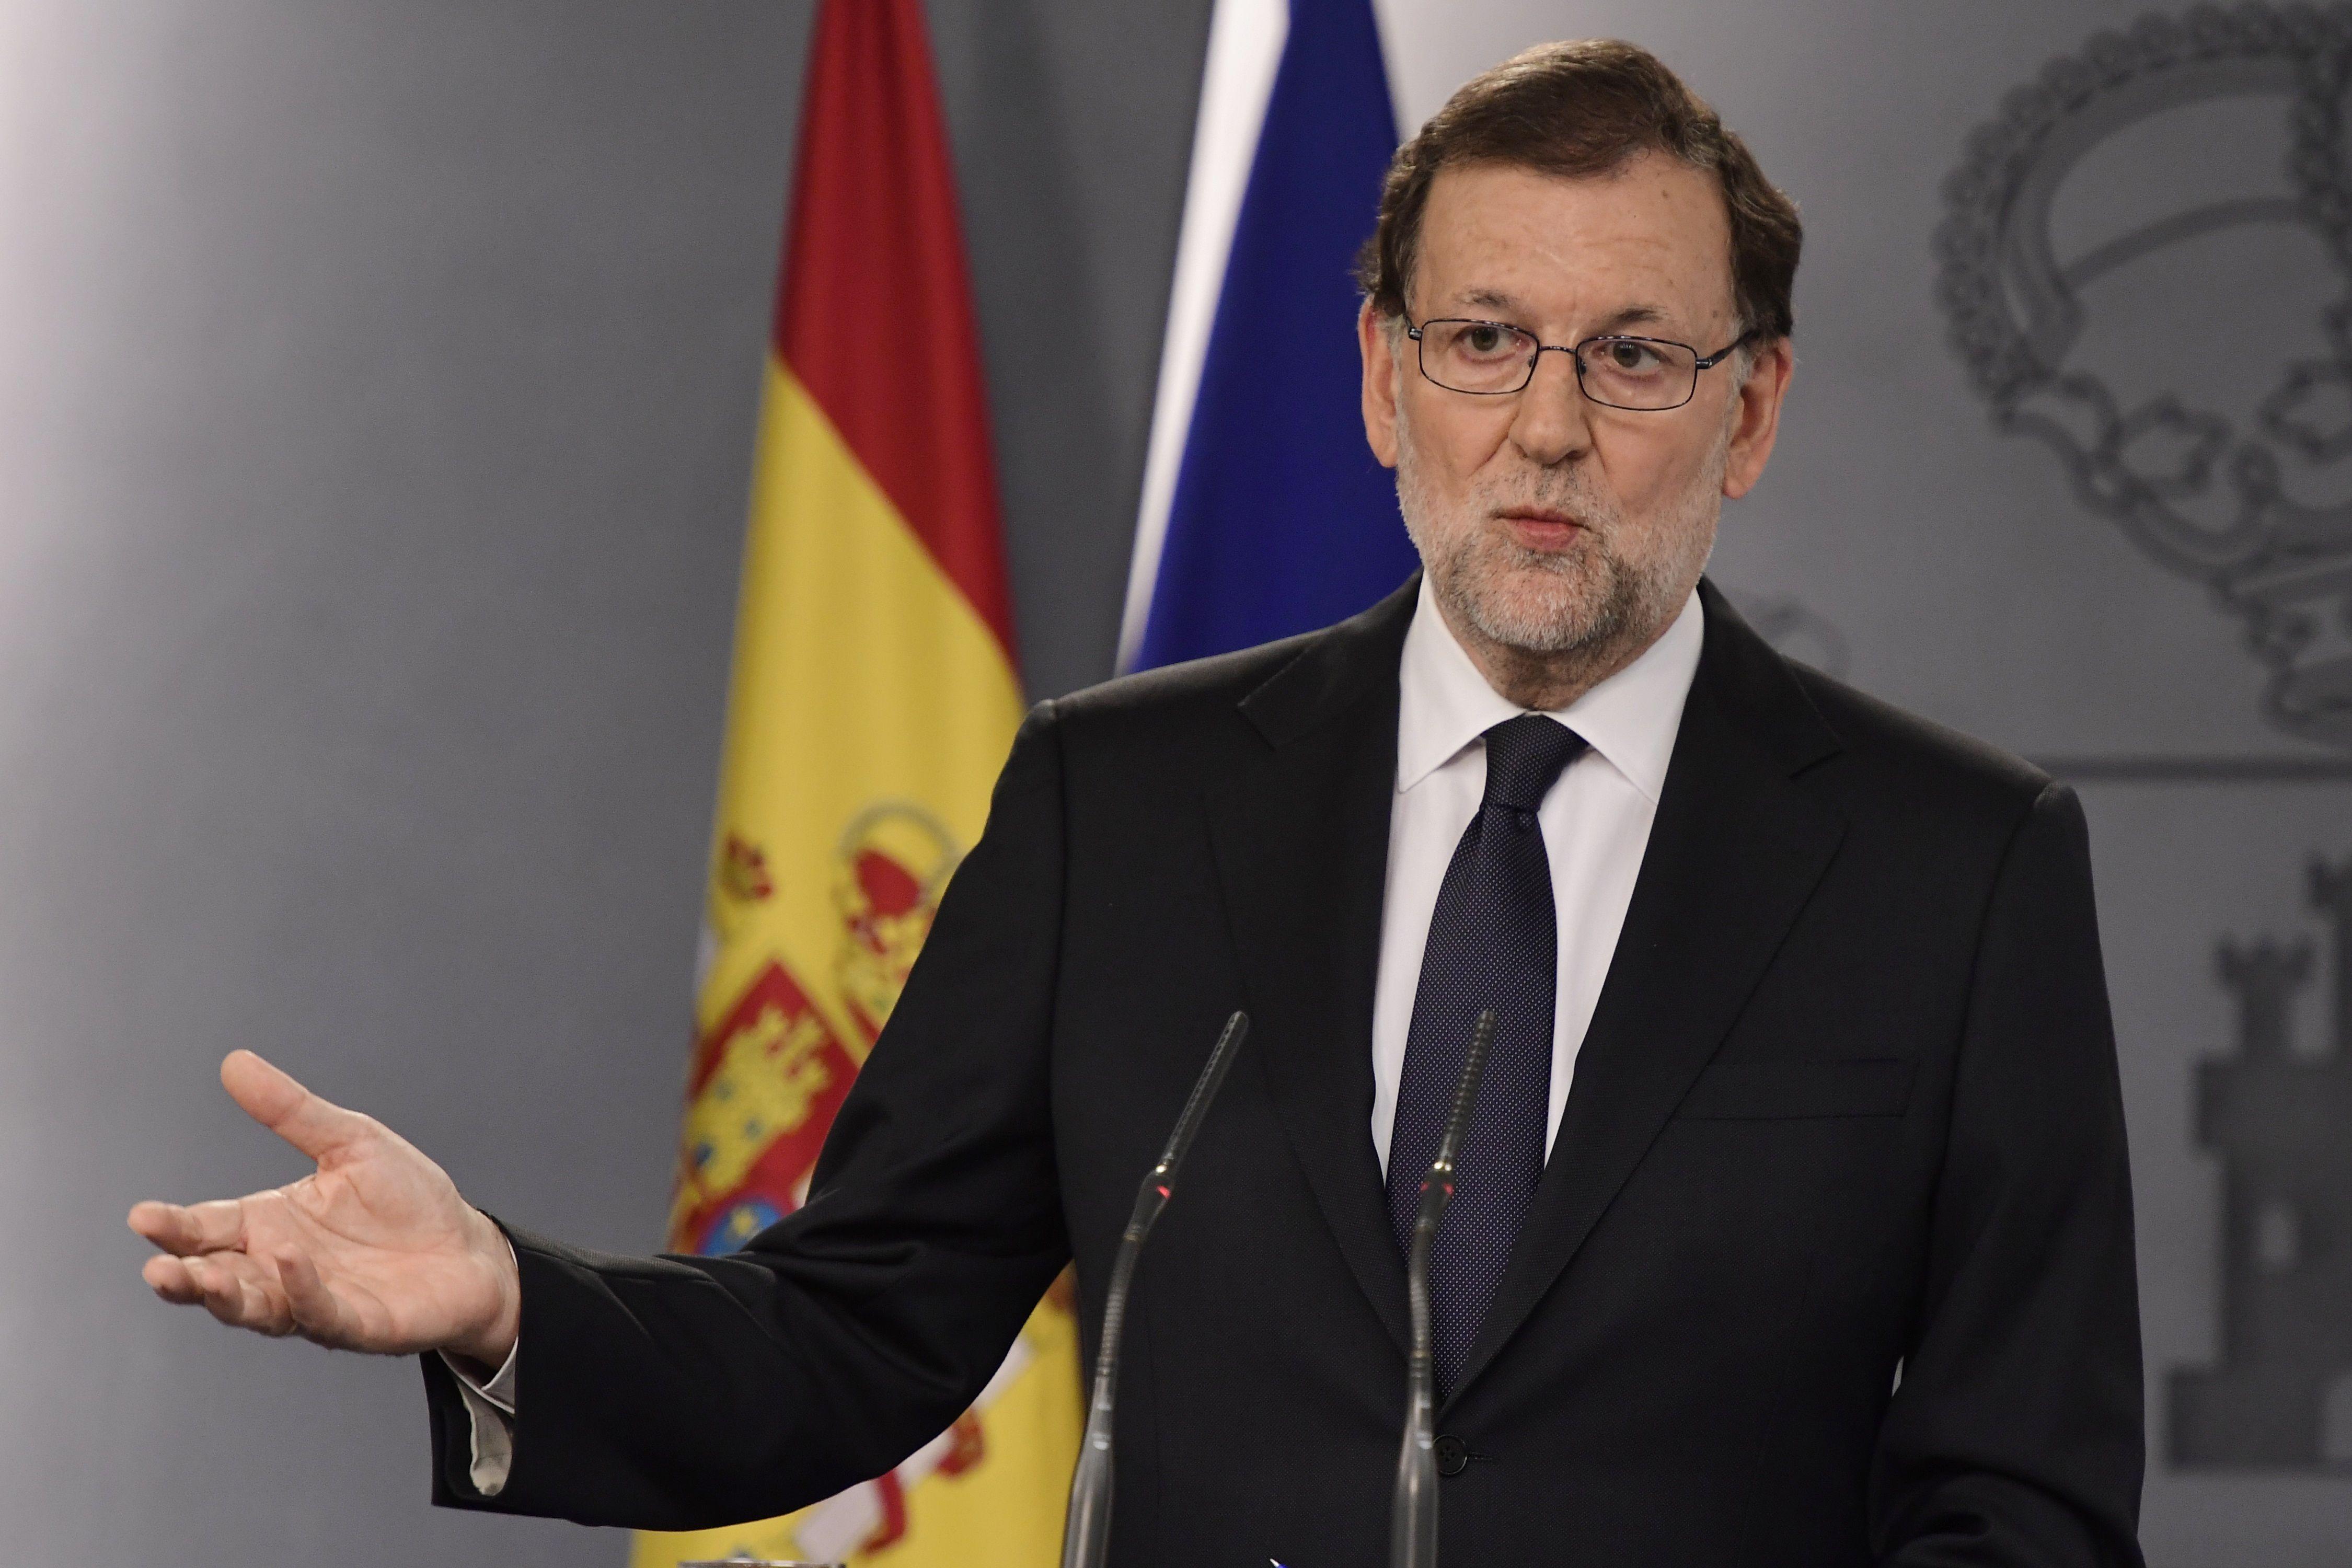 Venezuela declara embaixador de Espanha